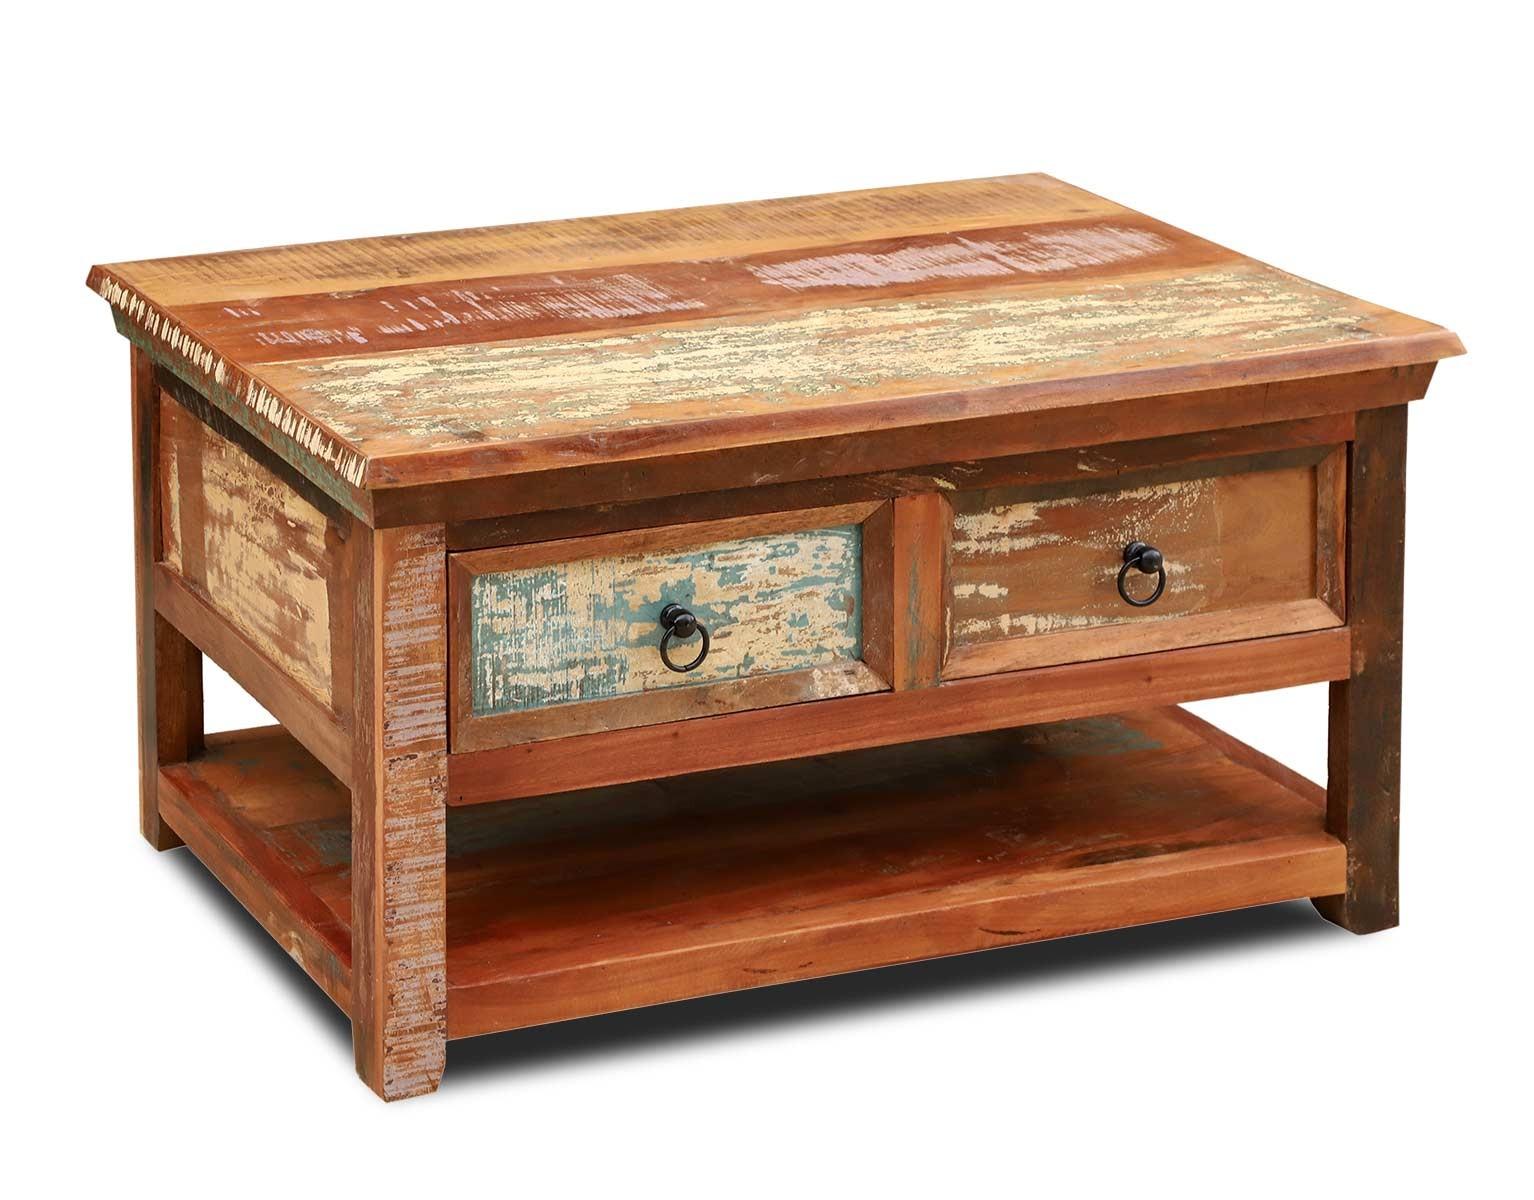 Reclaimed Wood Coffee Table 2 Drawers Lower Shelf